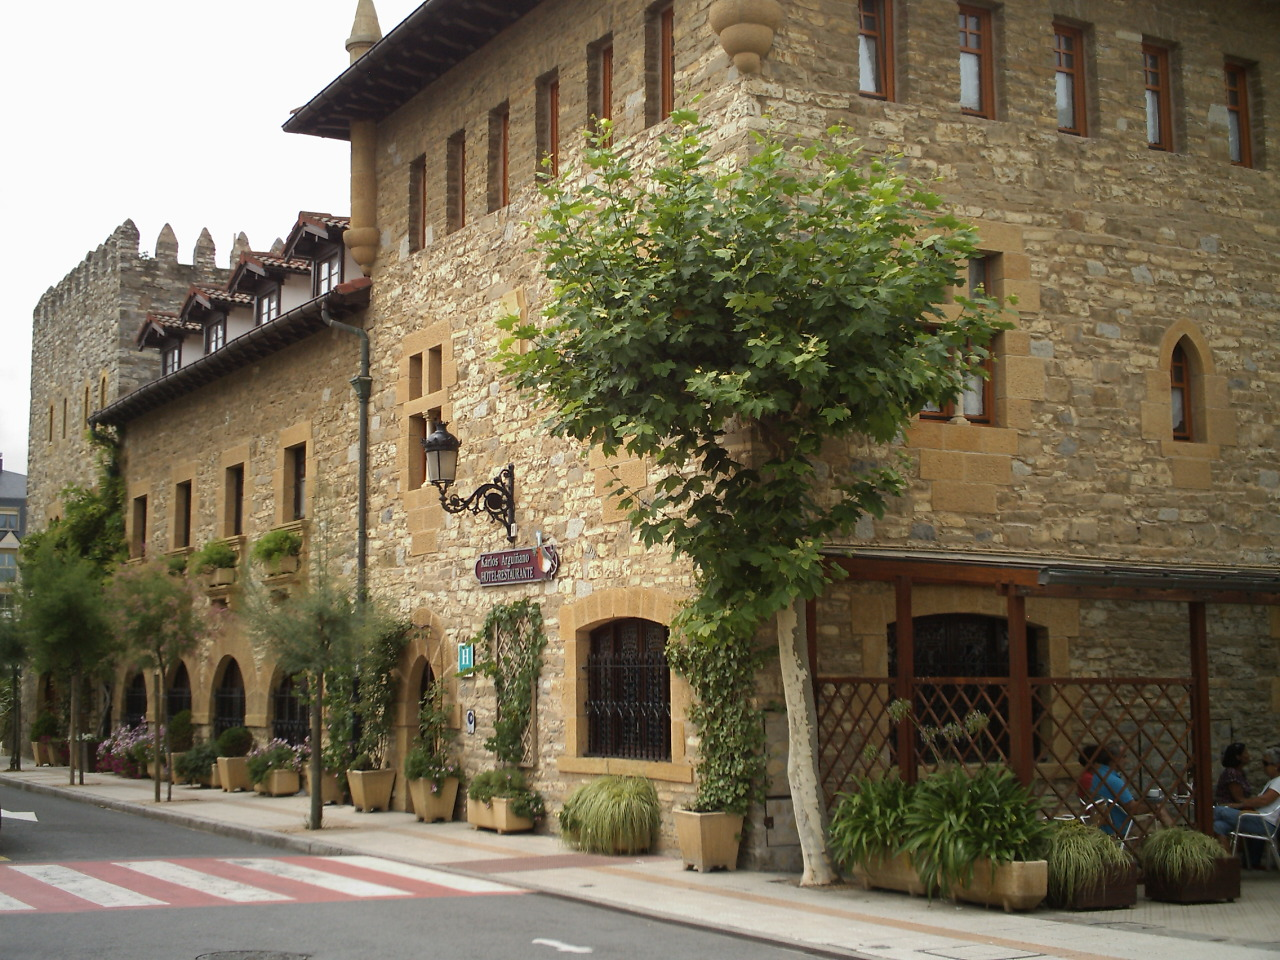 Fitxategi restaurante y hotel de carlos argui ano en for Hotels zarautz